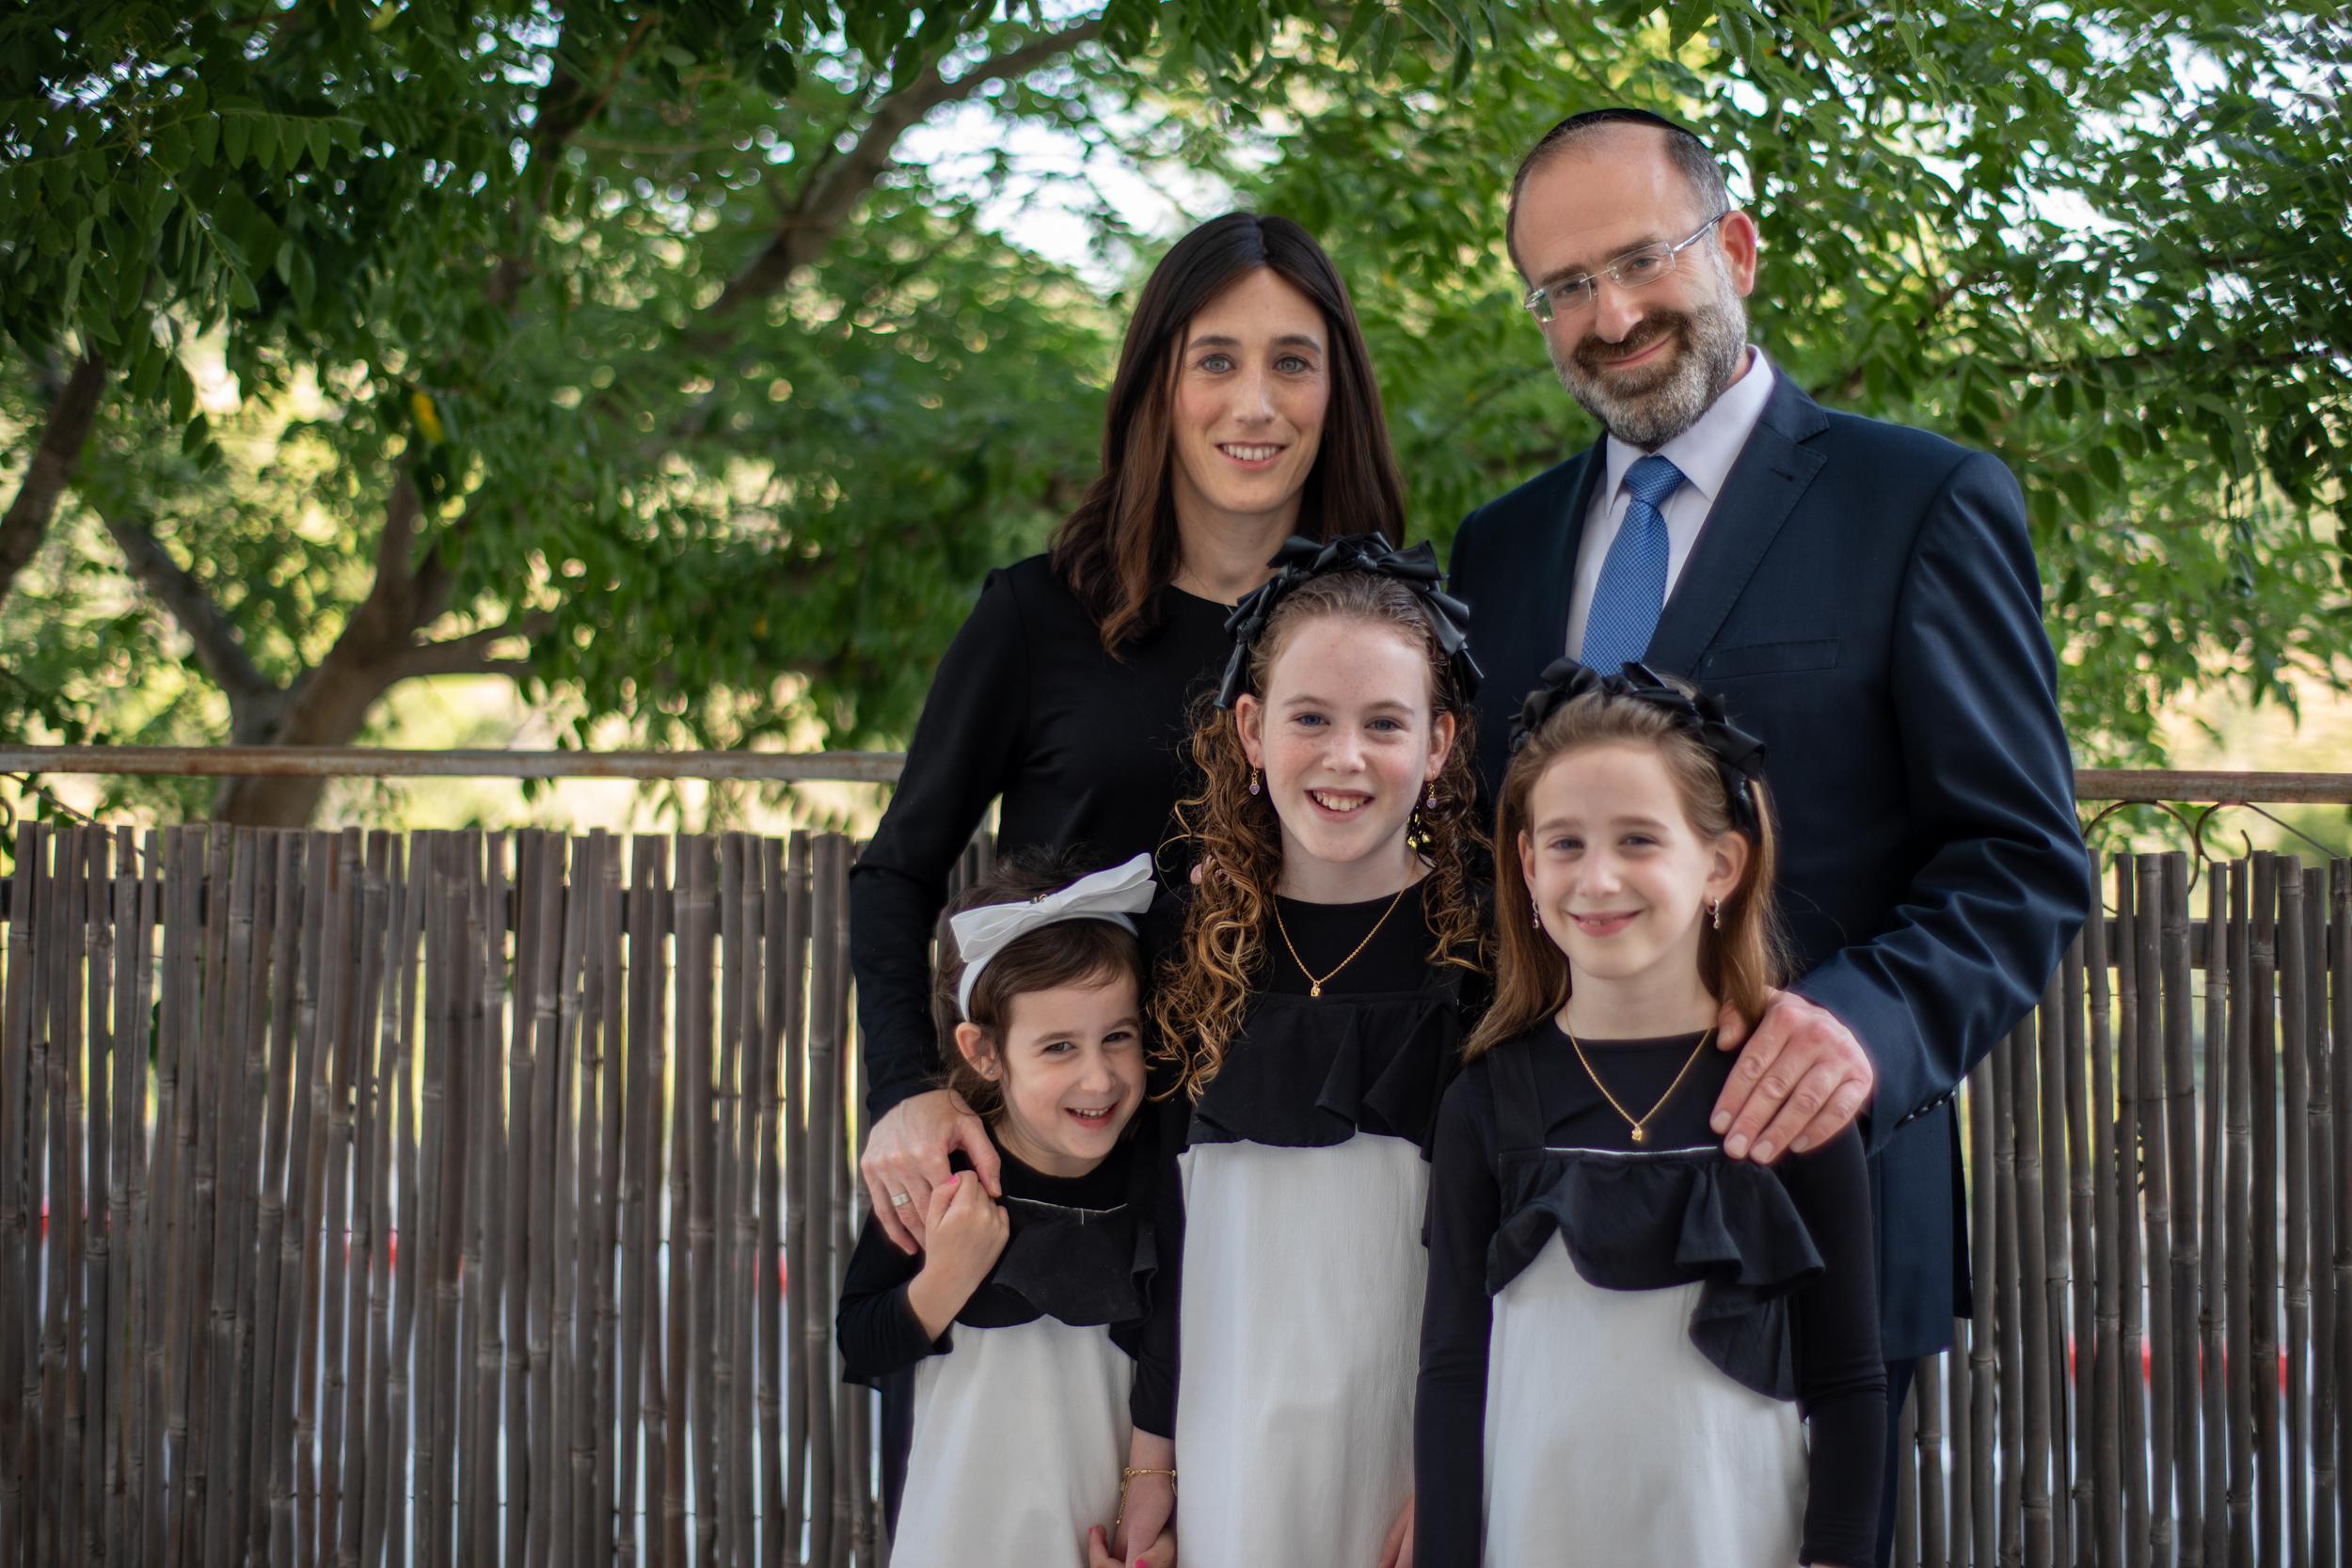 families_jdc_6633.jpg